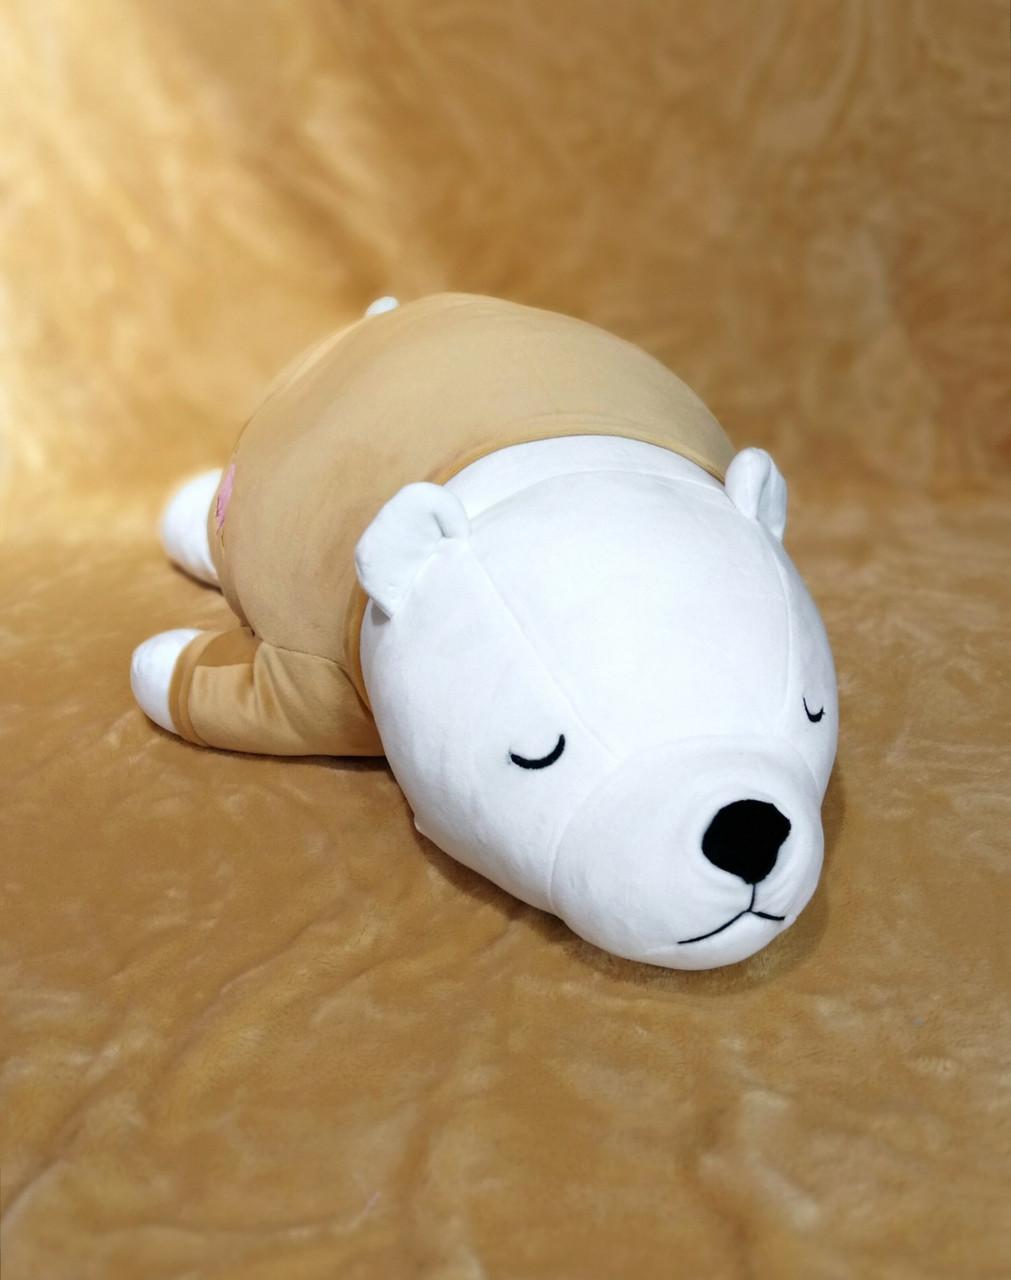 Игрушка-подушка Белый мишка с пледом внутри